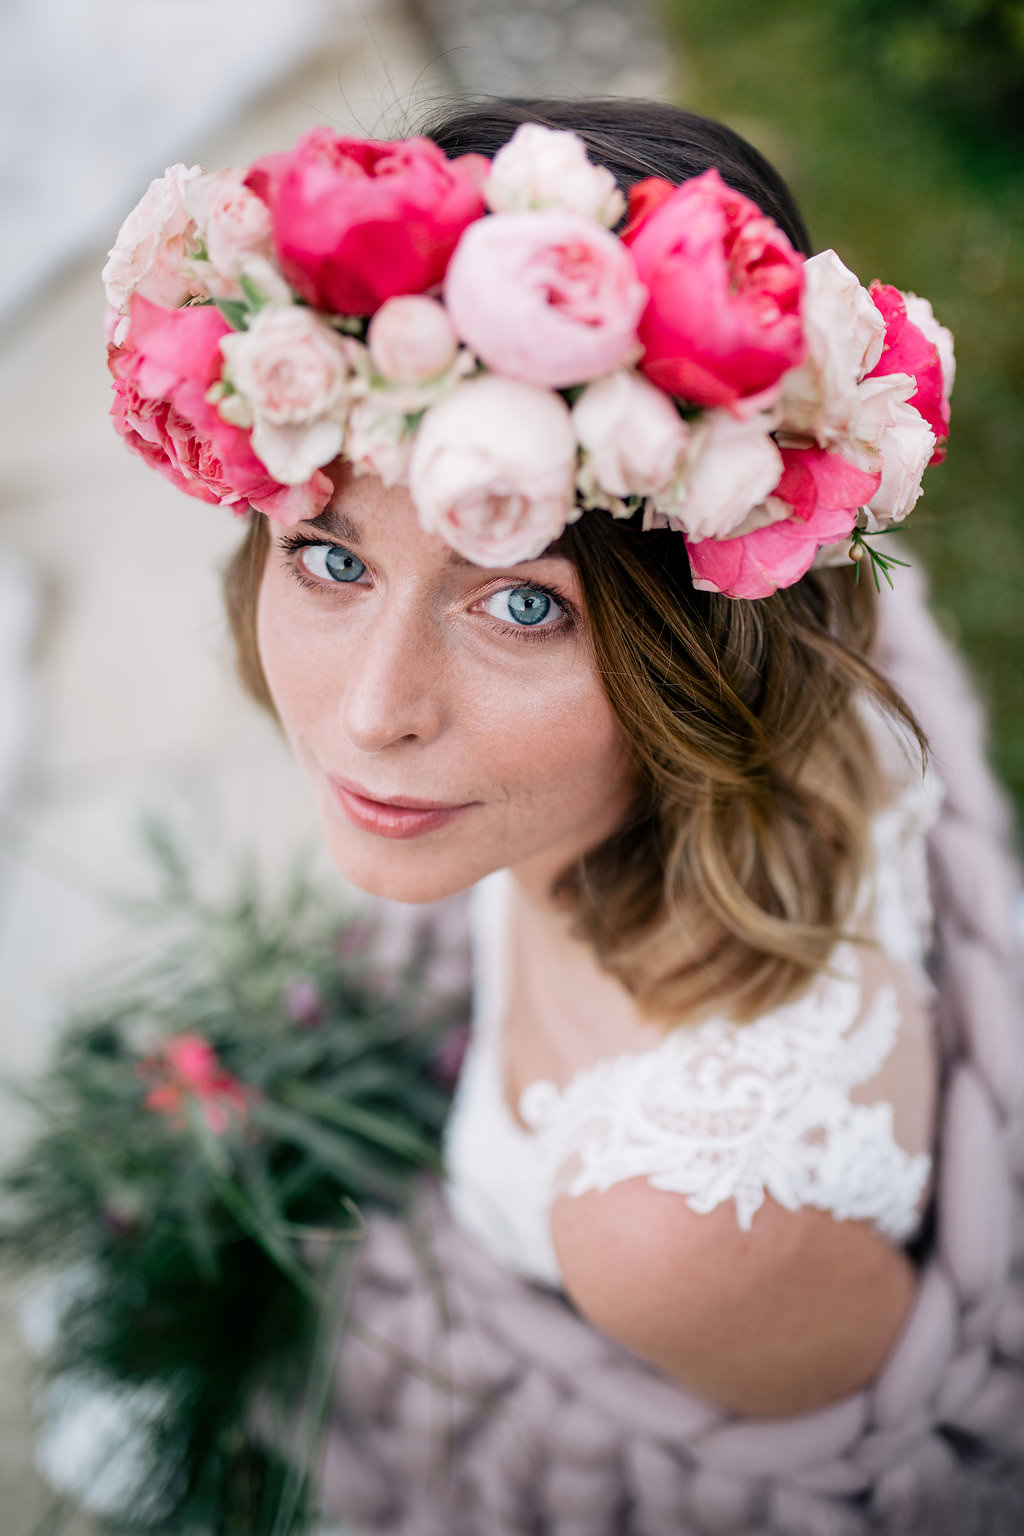 Flower Crown Bride Bridal Pink Rose Ranunculus Peony Lapstone Barn Wedding Ideas Cotswolds Katie Hamilton Photography